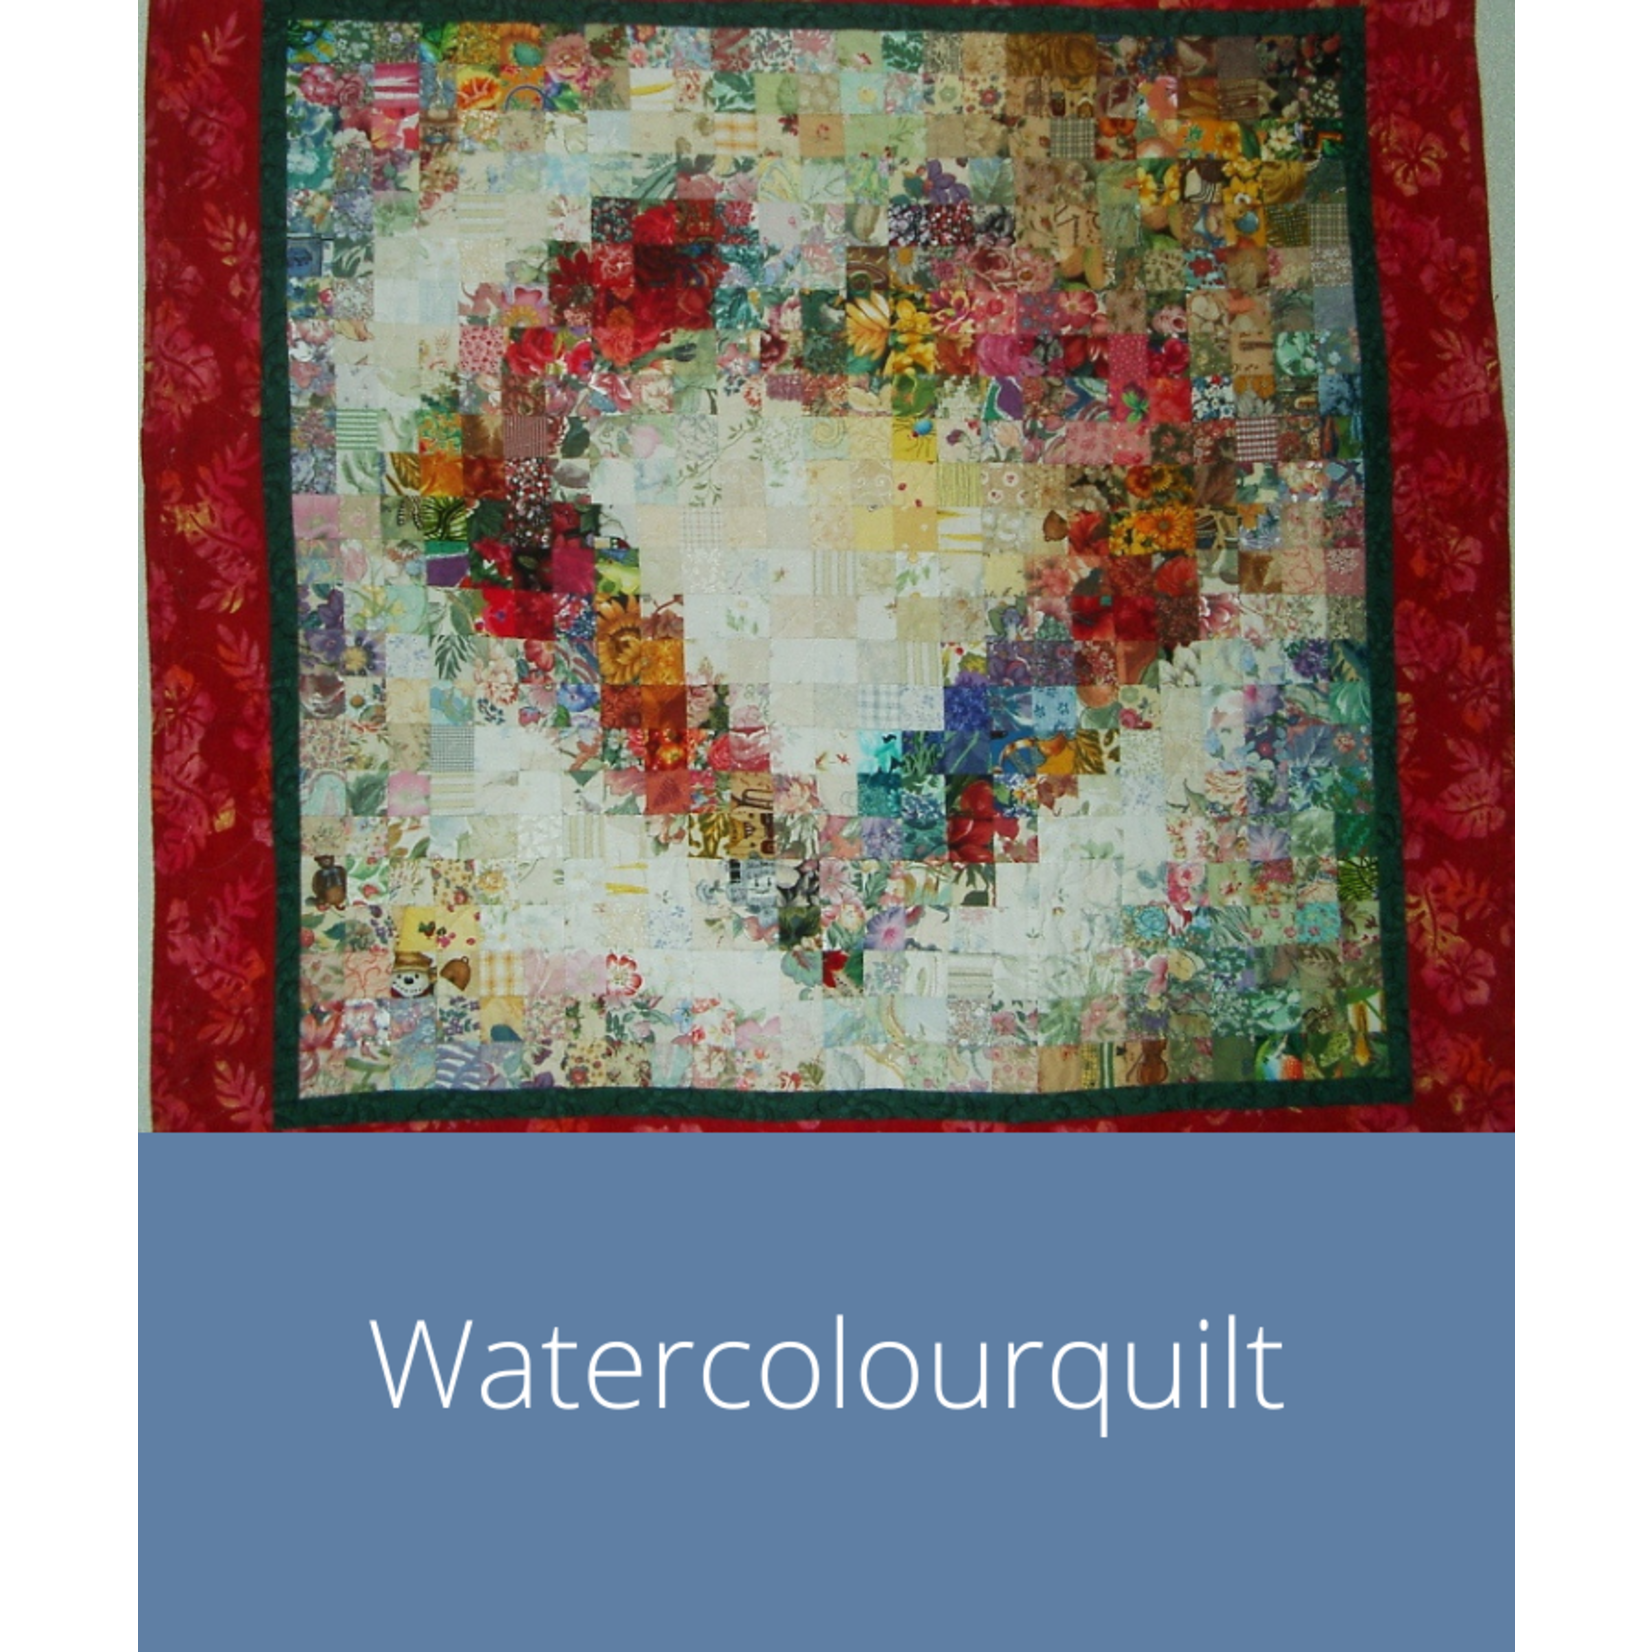 Cursus - Watercolourquilt  | donderdag 23 september